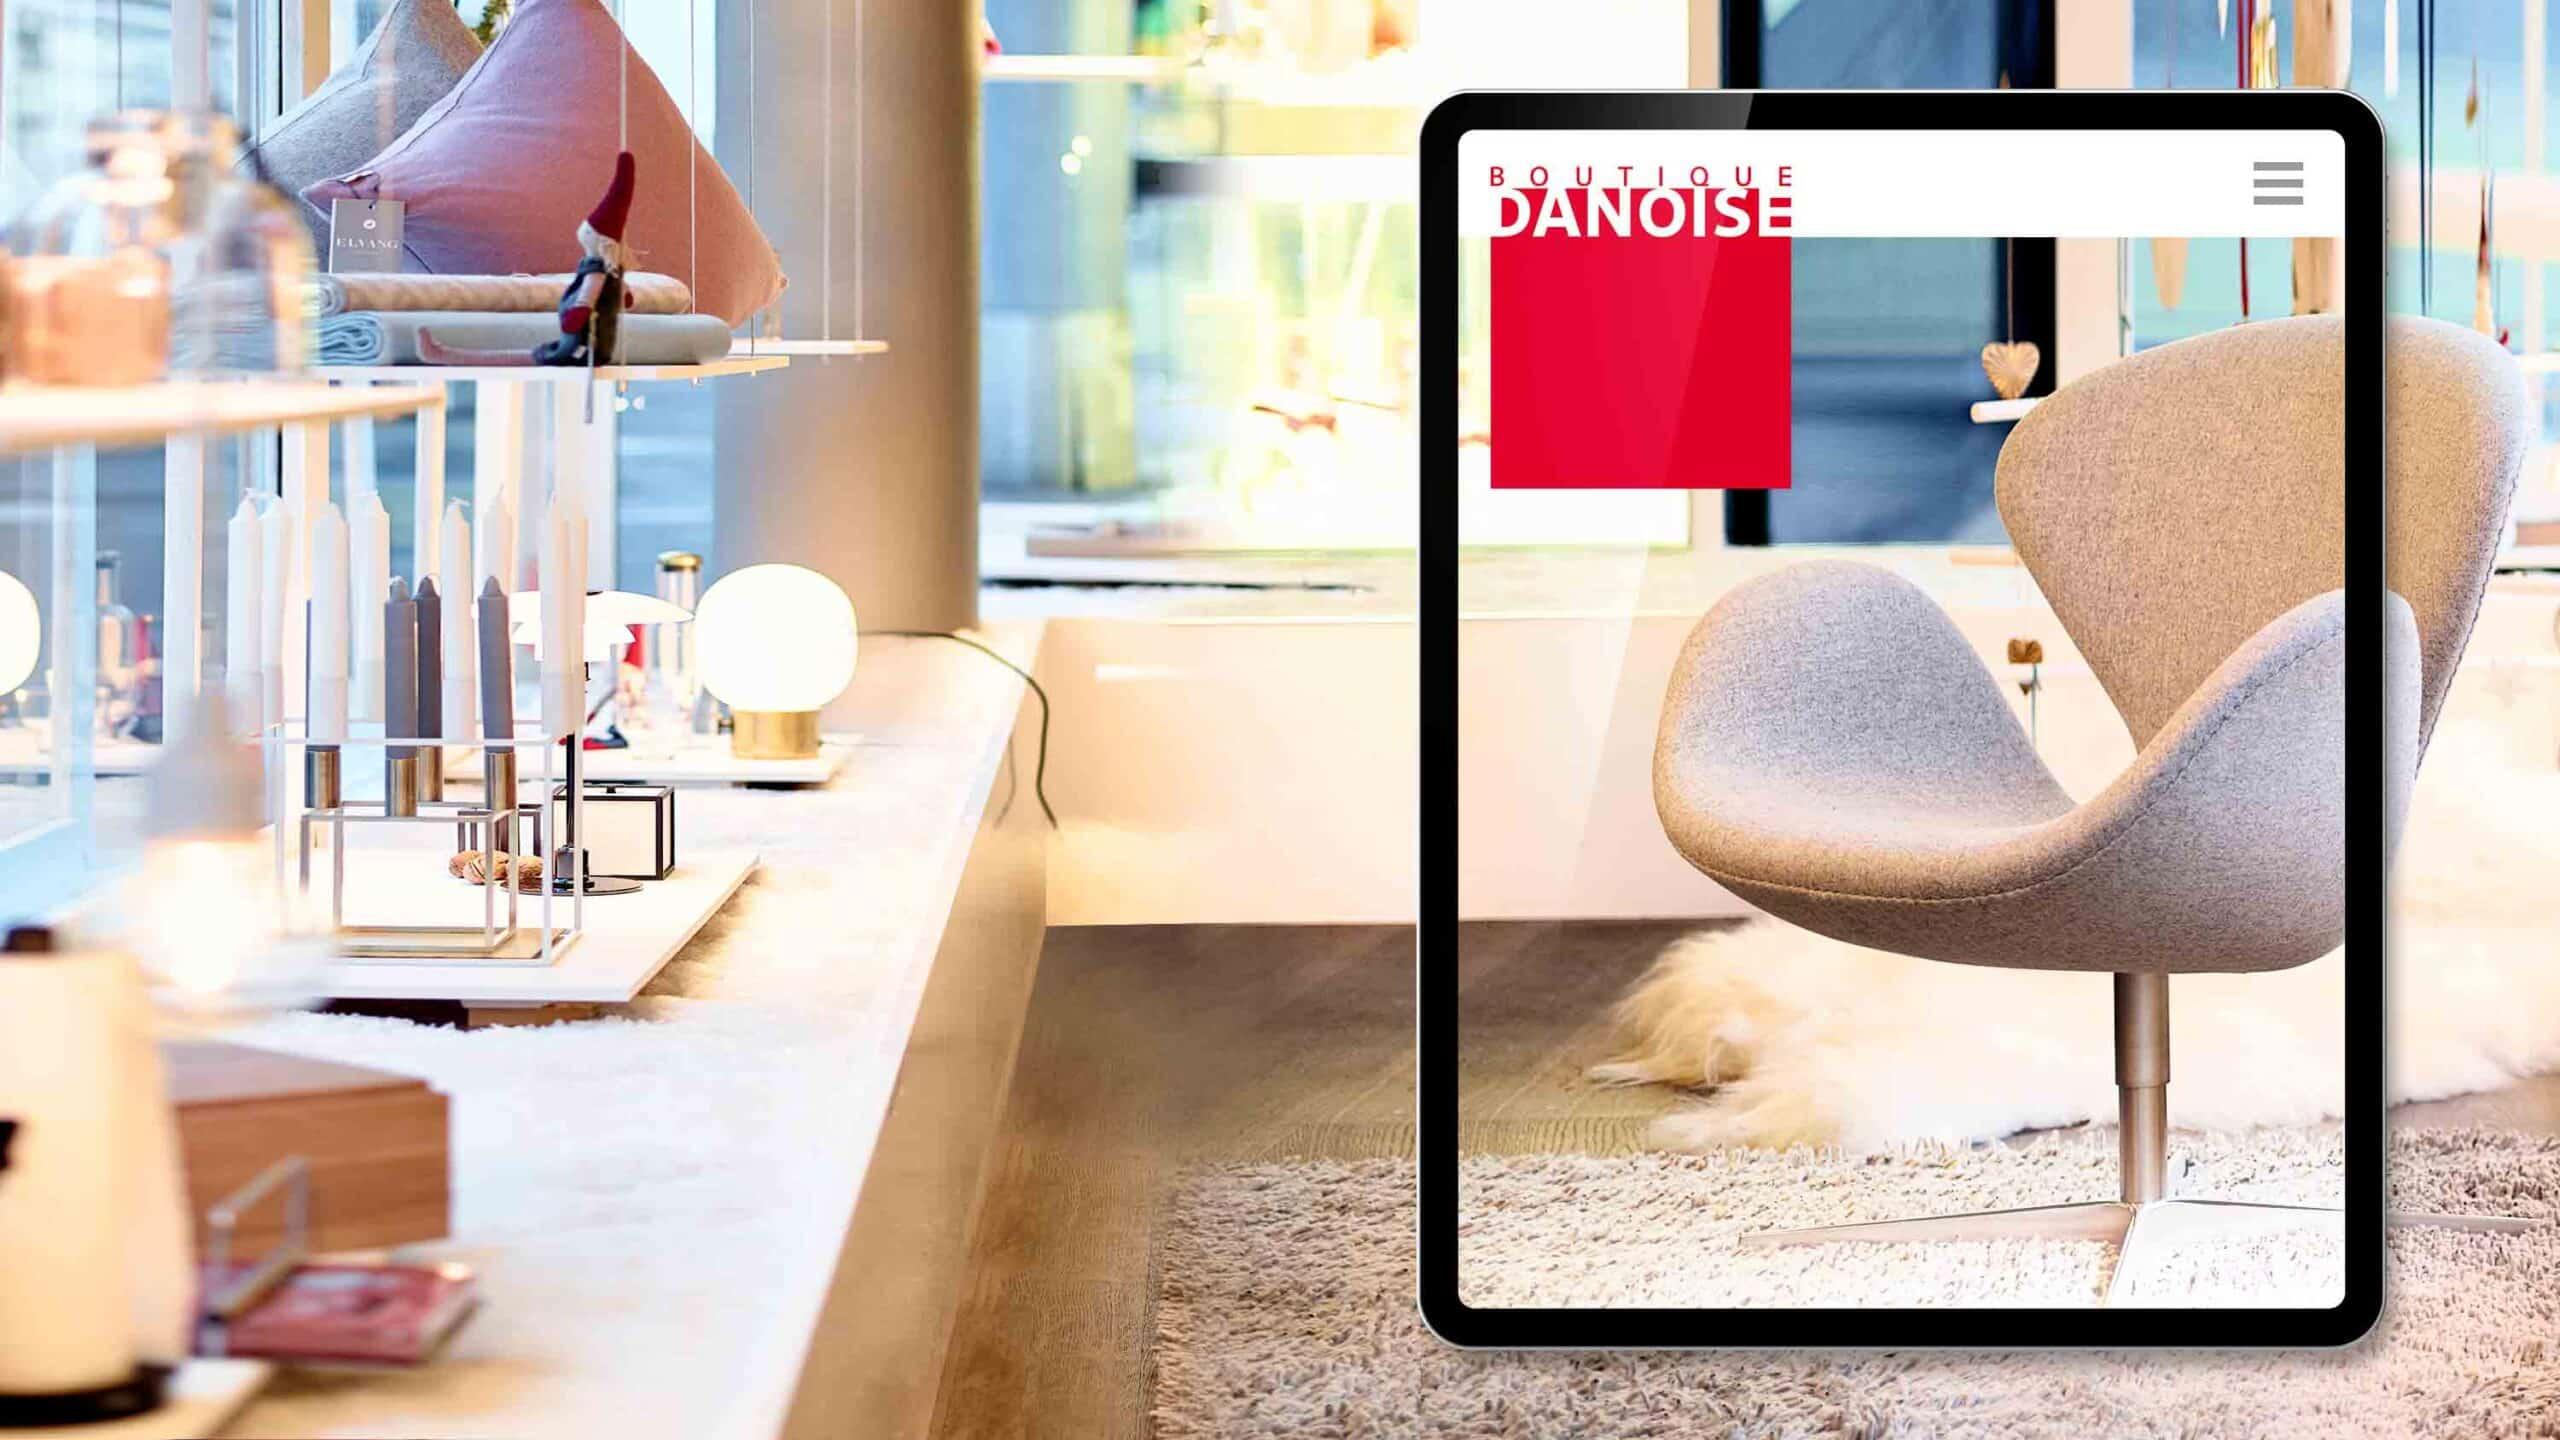 Online Shop Corporate Website Webdesign Web Shop Movie Video SEO Digital Agentur Webagentur Webseite Webdesign Grafik Design Boutique Danoise Basel ShowMyProject 2021